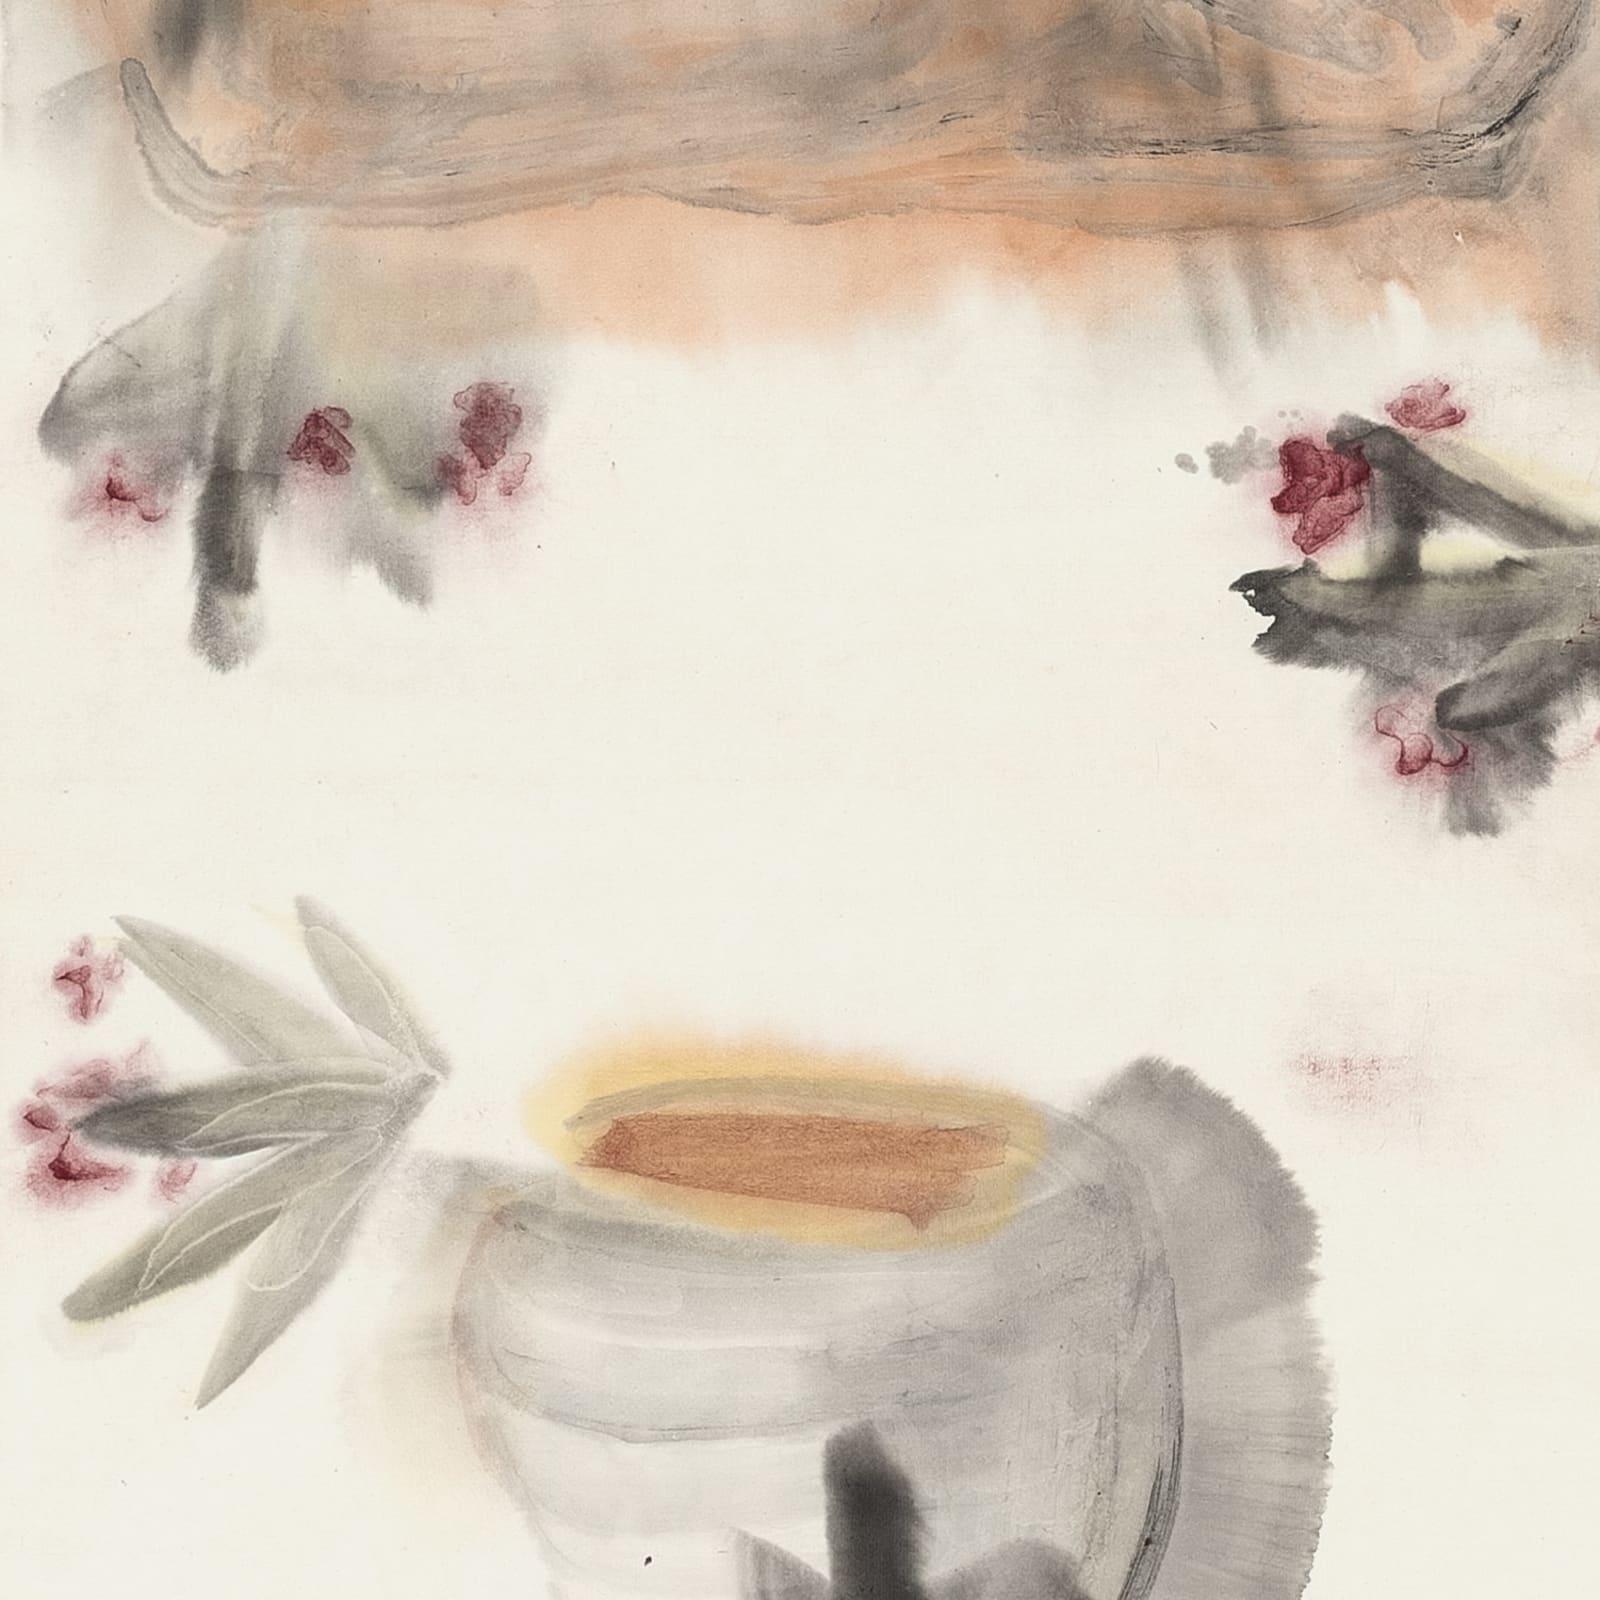 Li Jin 李津, Eaters Series: Floating 饕客系列:飘, 1995